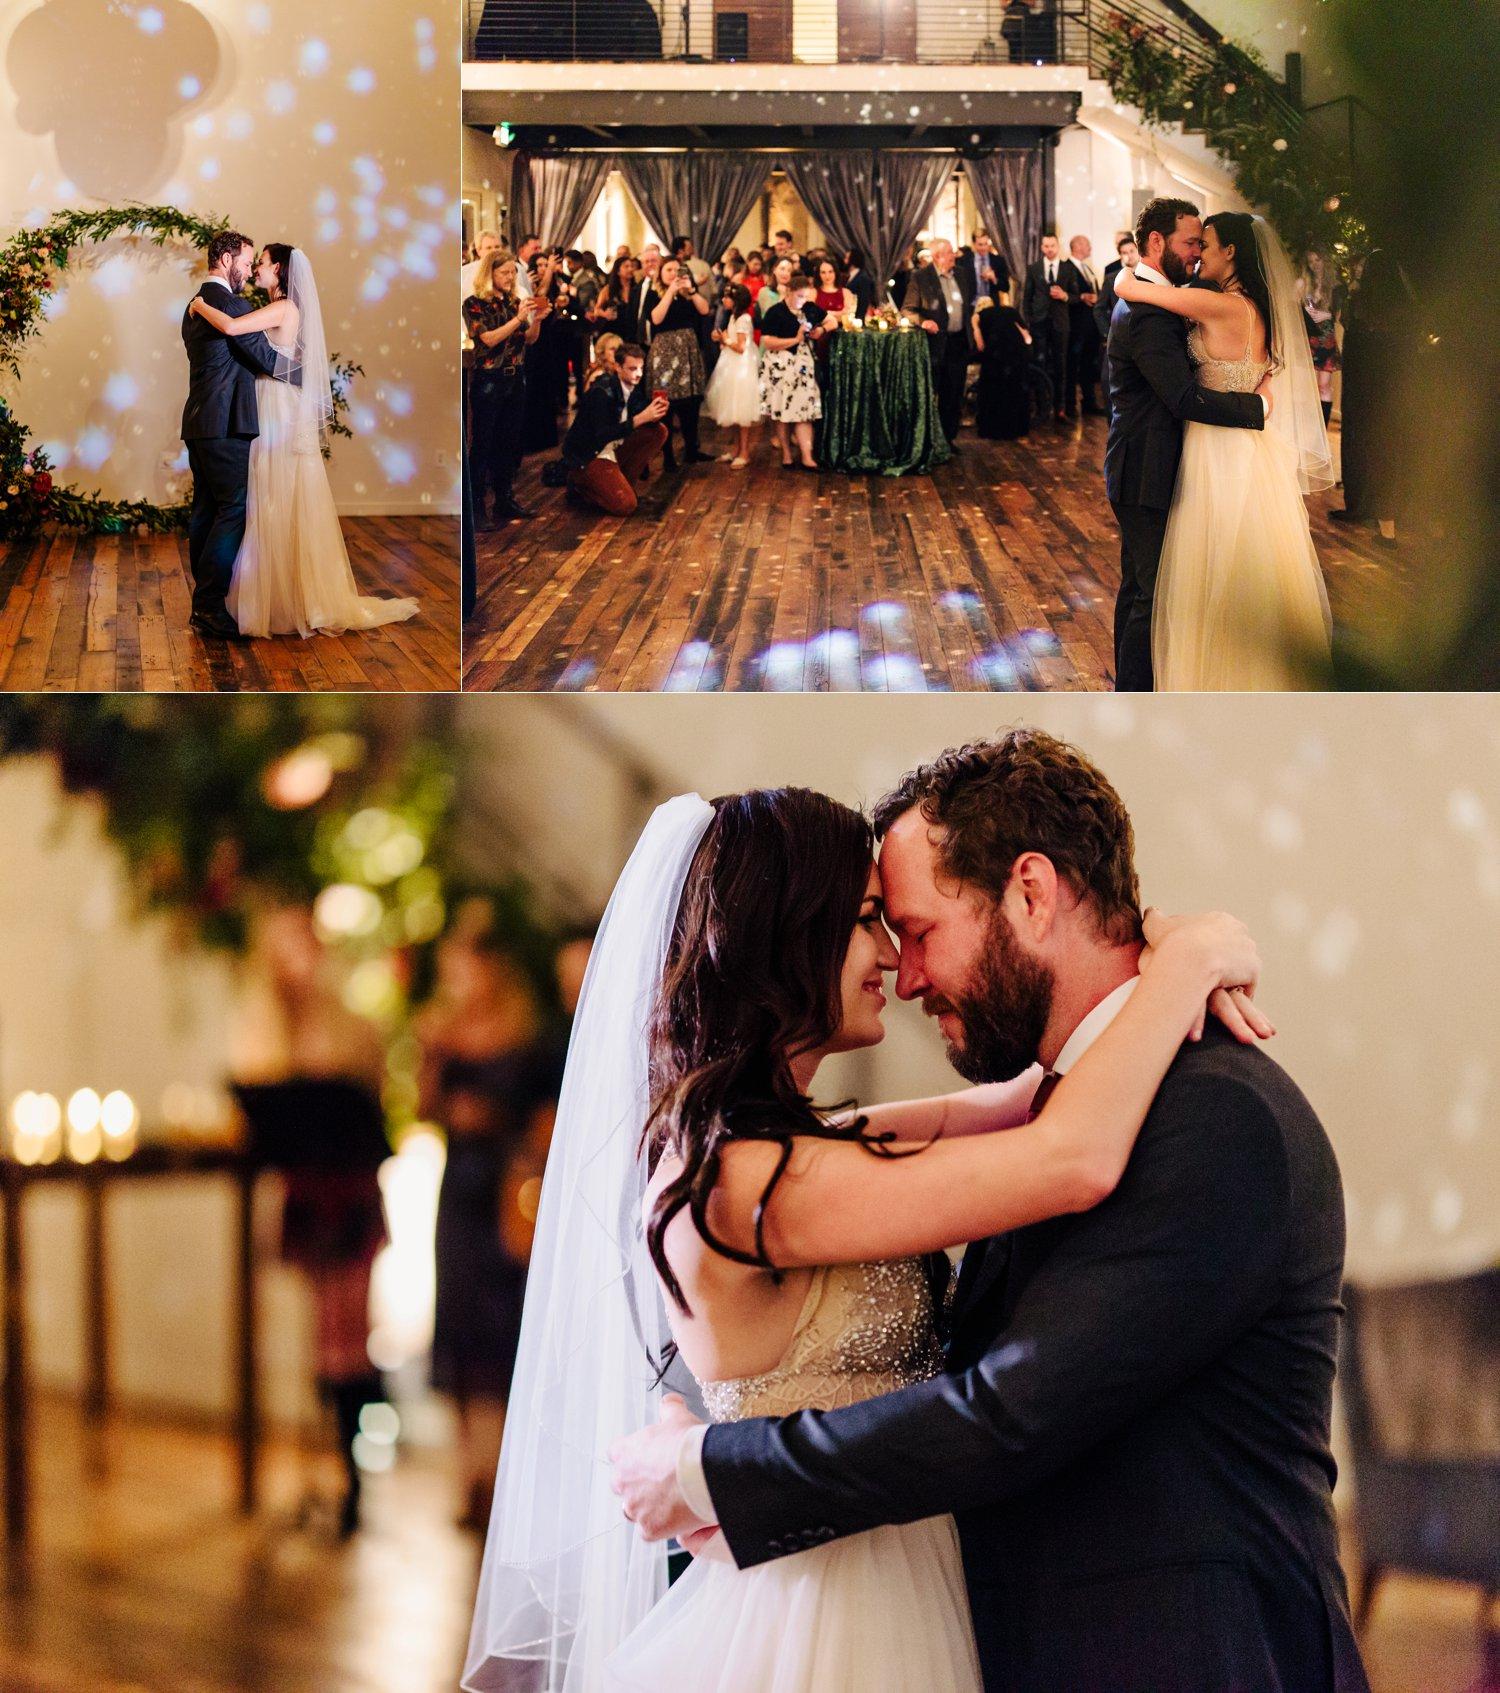 CK-Photo-Nashville-engagement-wedding-photographer-the-cordelle_0044.jpg